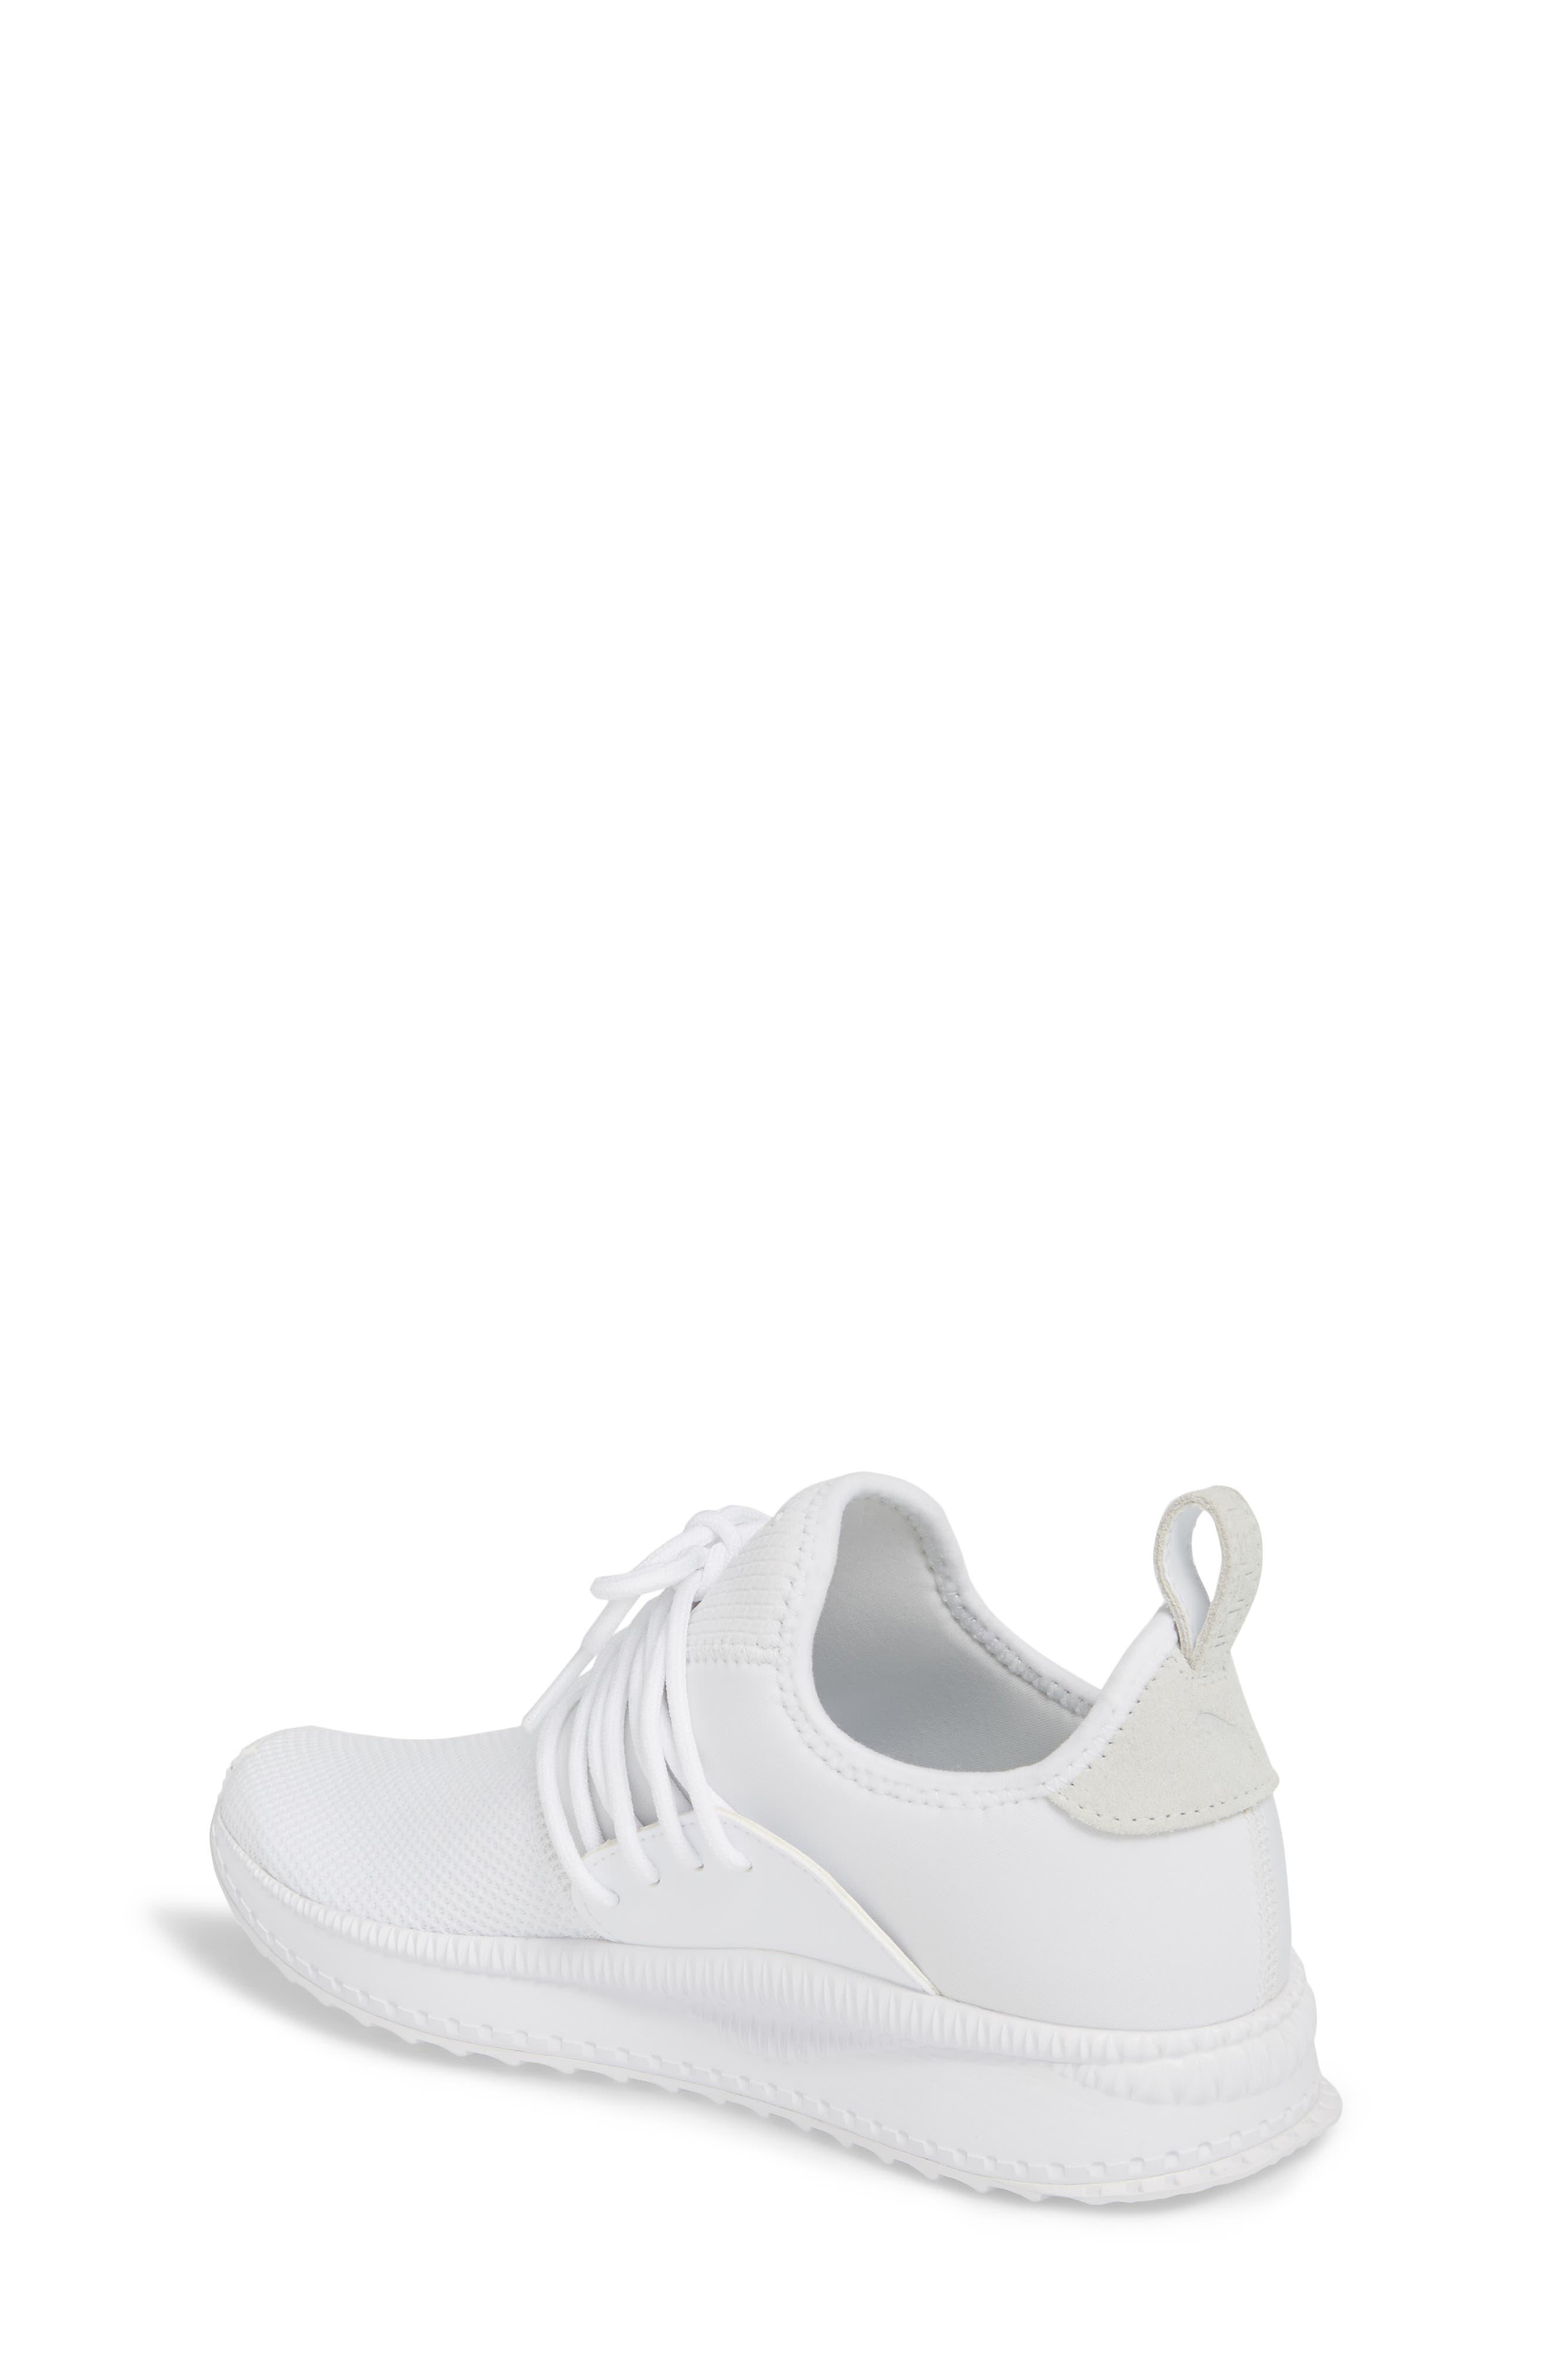 Tsugi Apex Sneaker,                             Alternate thumbnail 2, color,                             White/ White